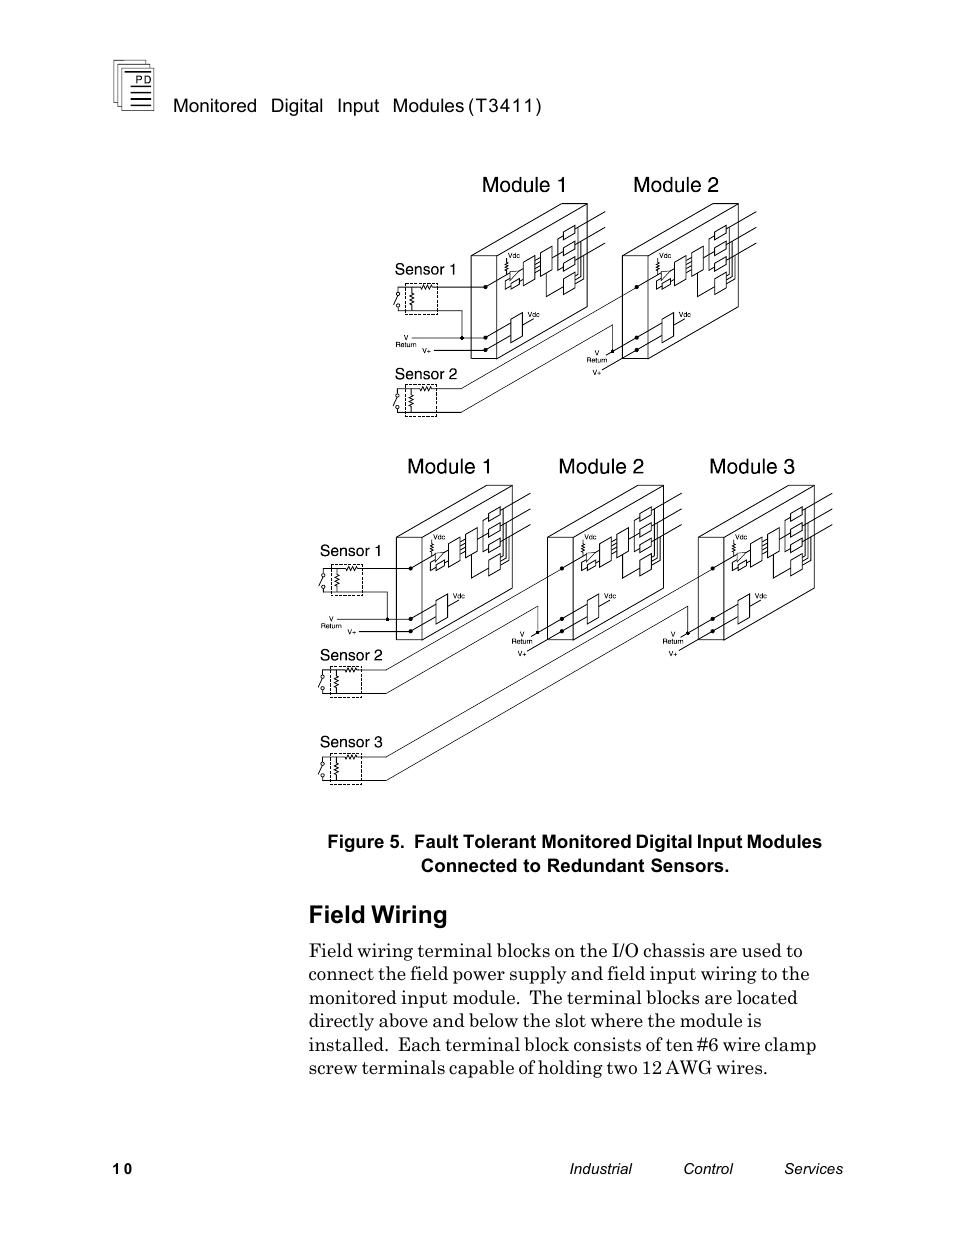 medium resolution of field wiring rockwell automation t3411 ics regent monitored digital input modules user manual page 10 26